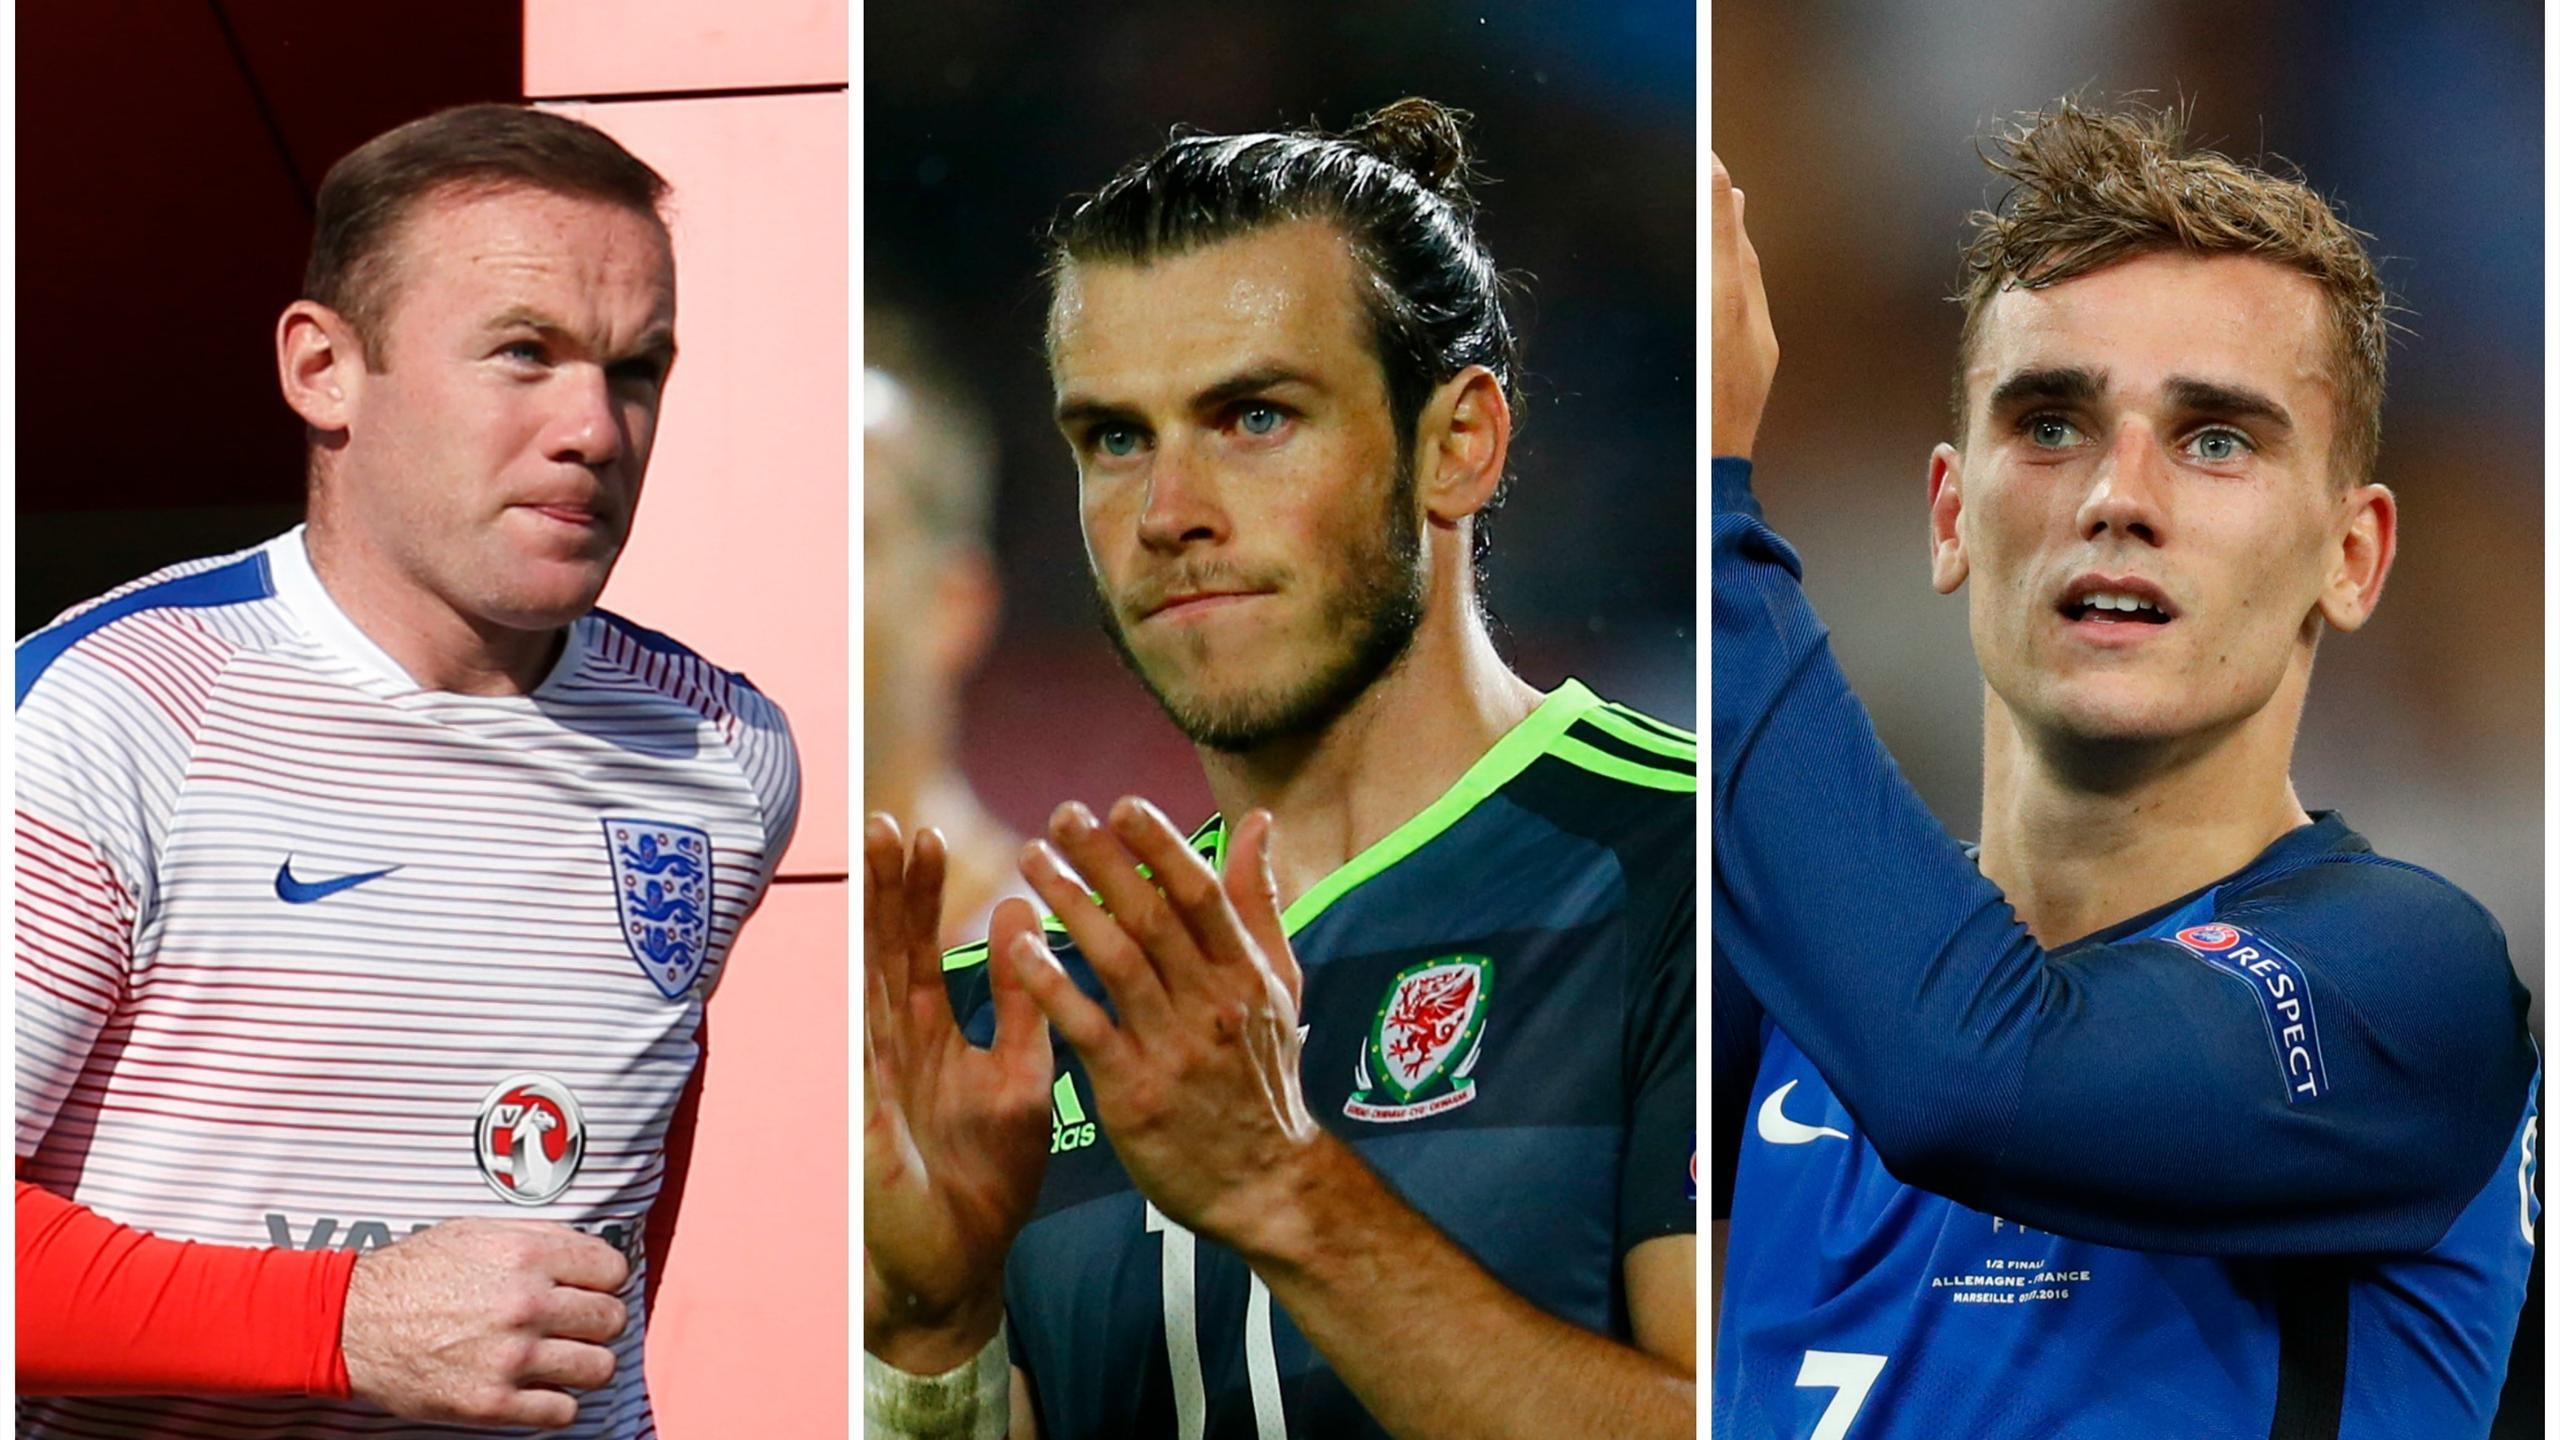 Wayne Rooney, Gareth Bale and Antoine Griezmann